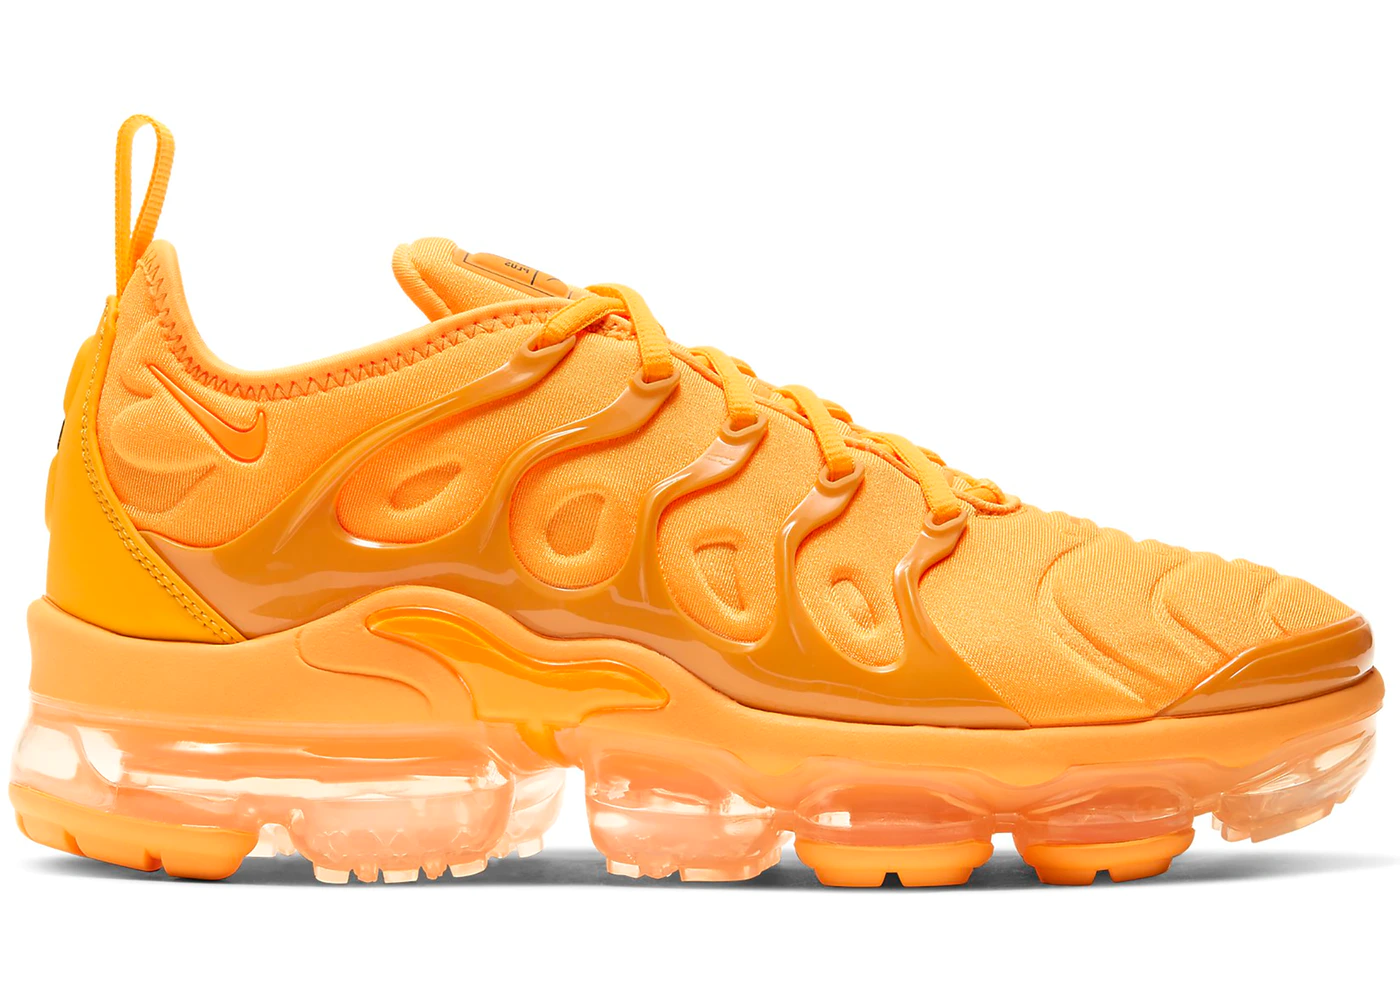 vapormax plus women's orange \u003e Factory